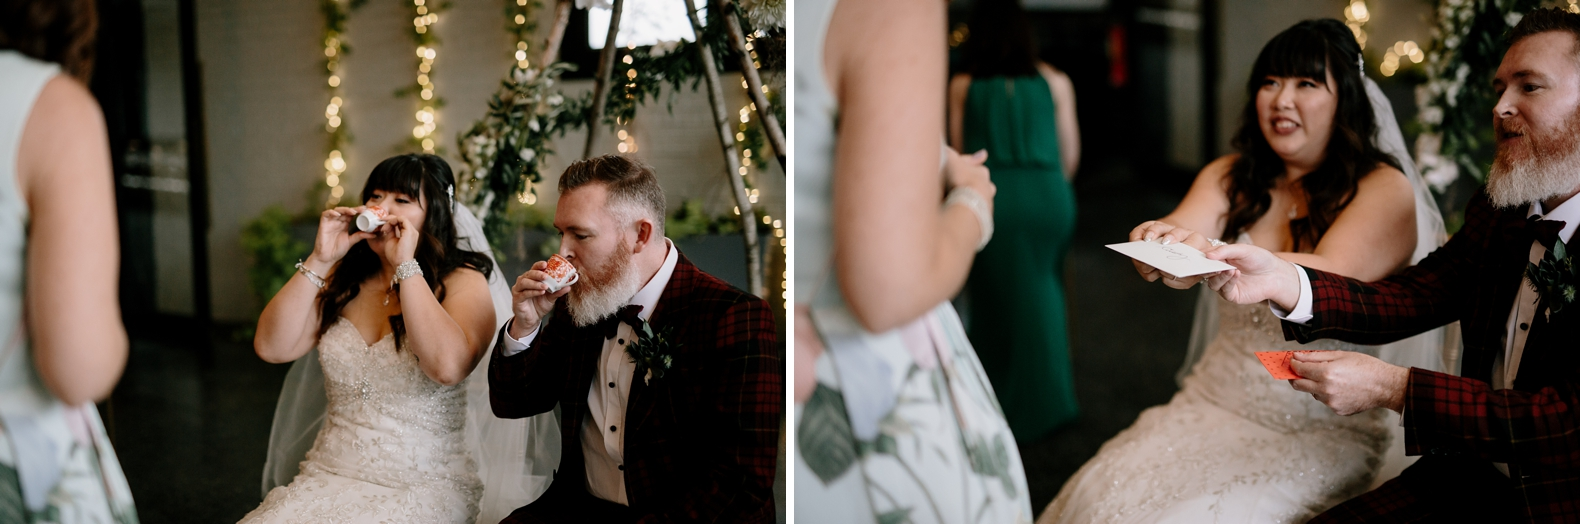 501-union-wedding-0090